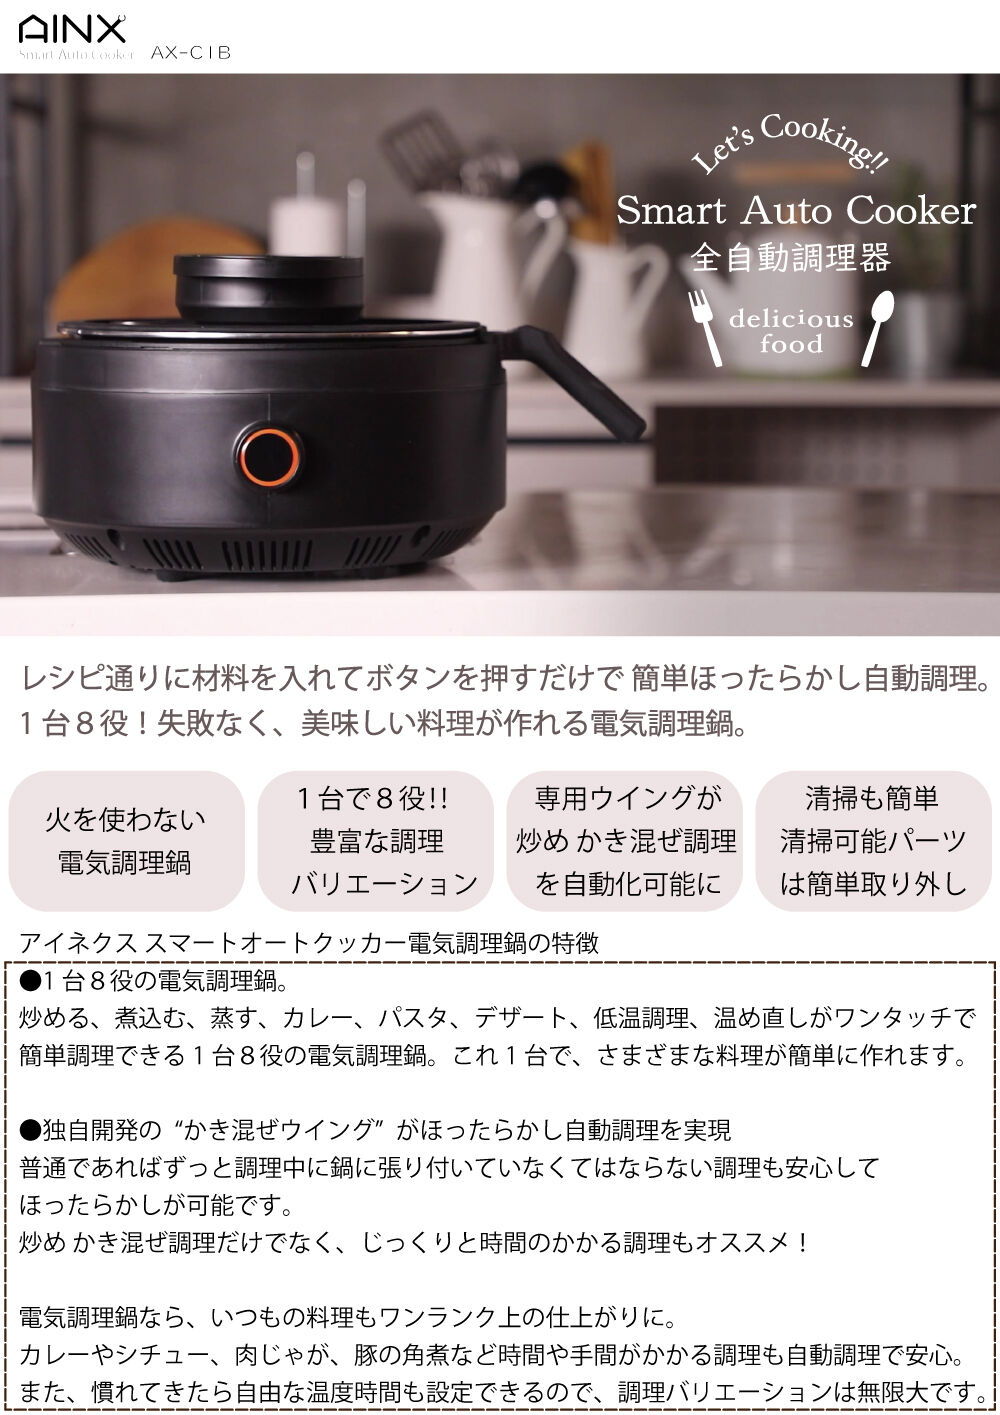 AINX スマートオートクッカー